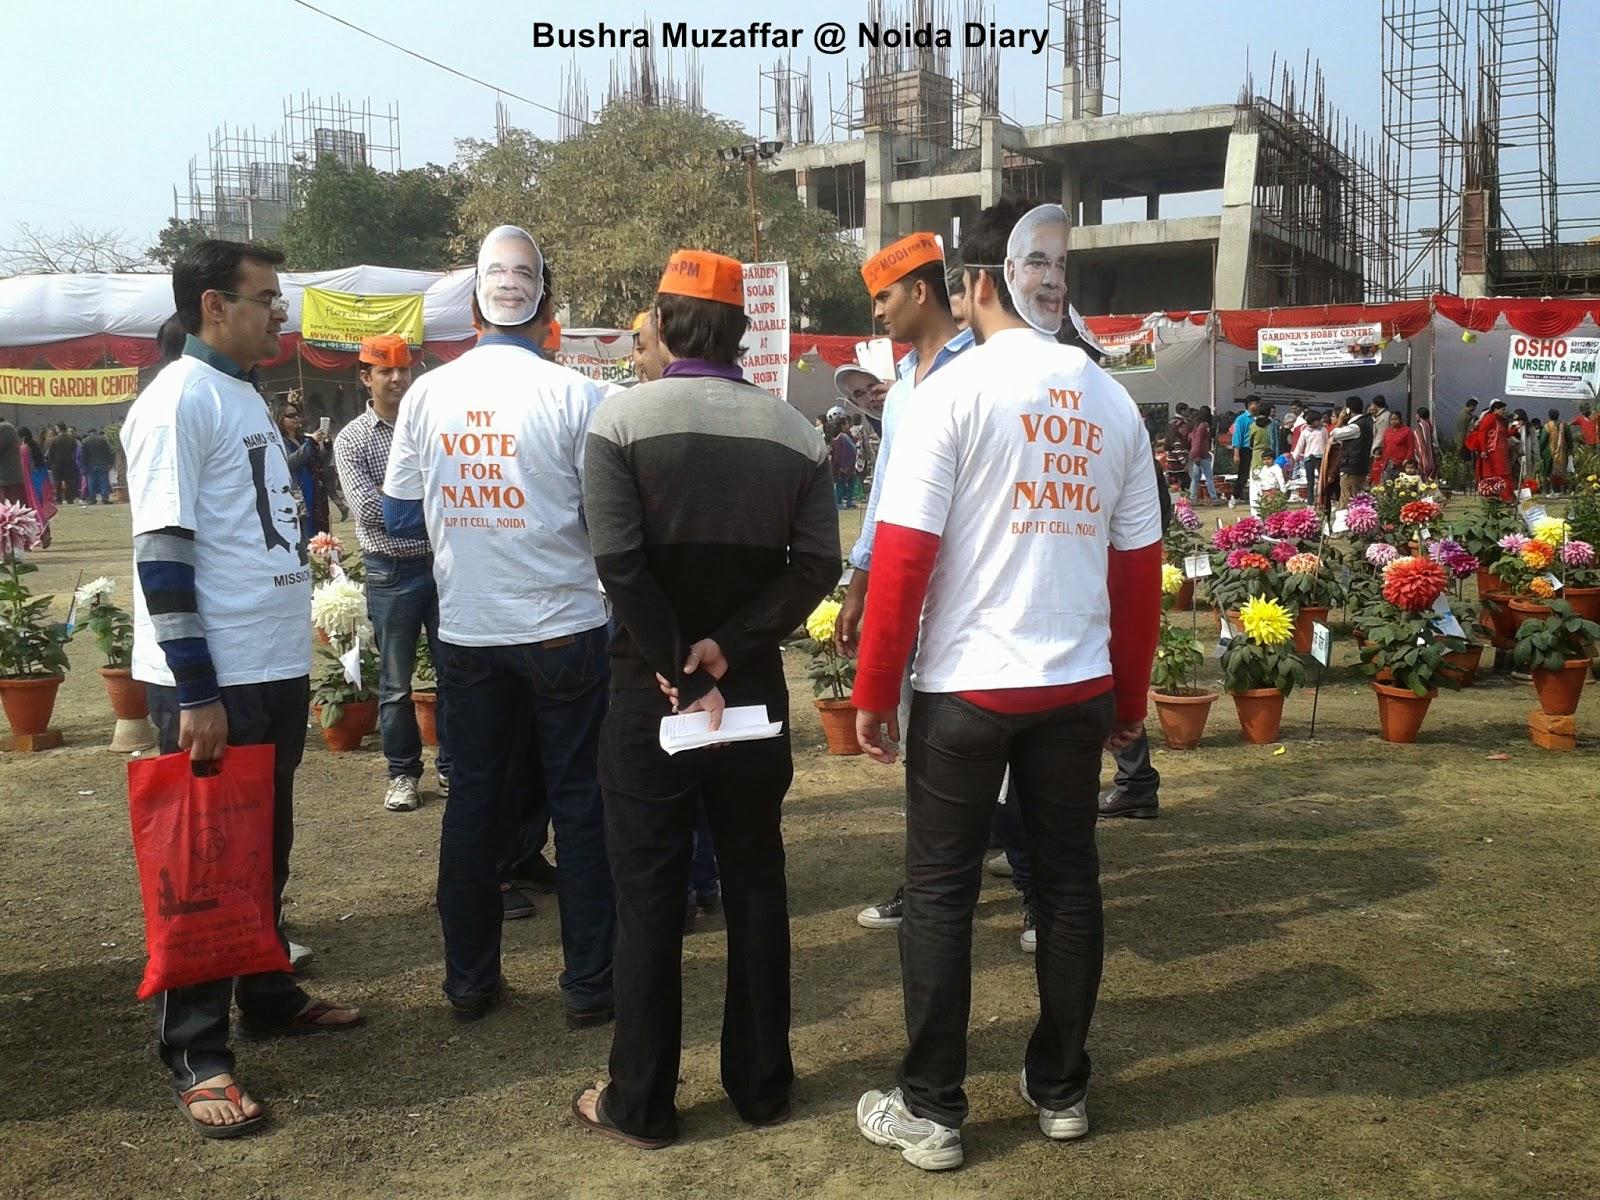 Namo Namo at Noida Flower Show 2014